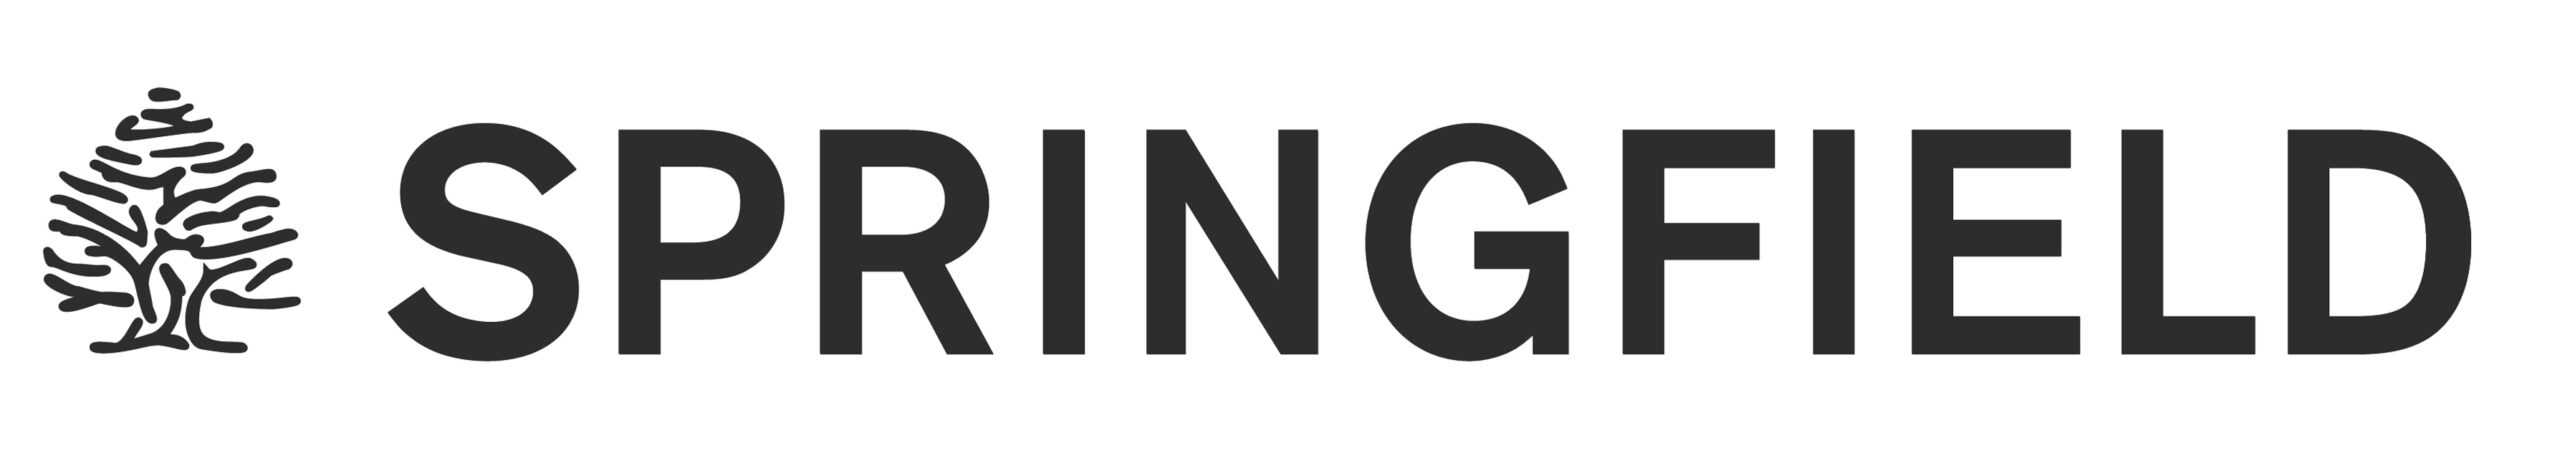 Imágenes Logotipos Springfield   Tendam Global Fashion Retail